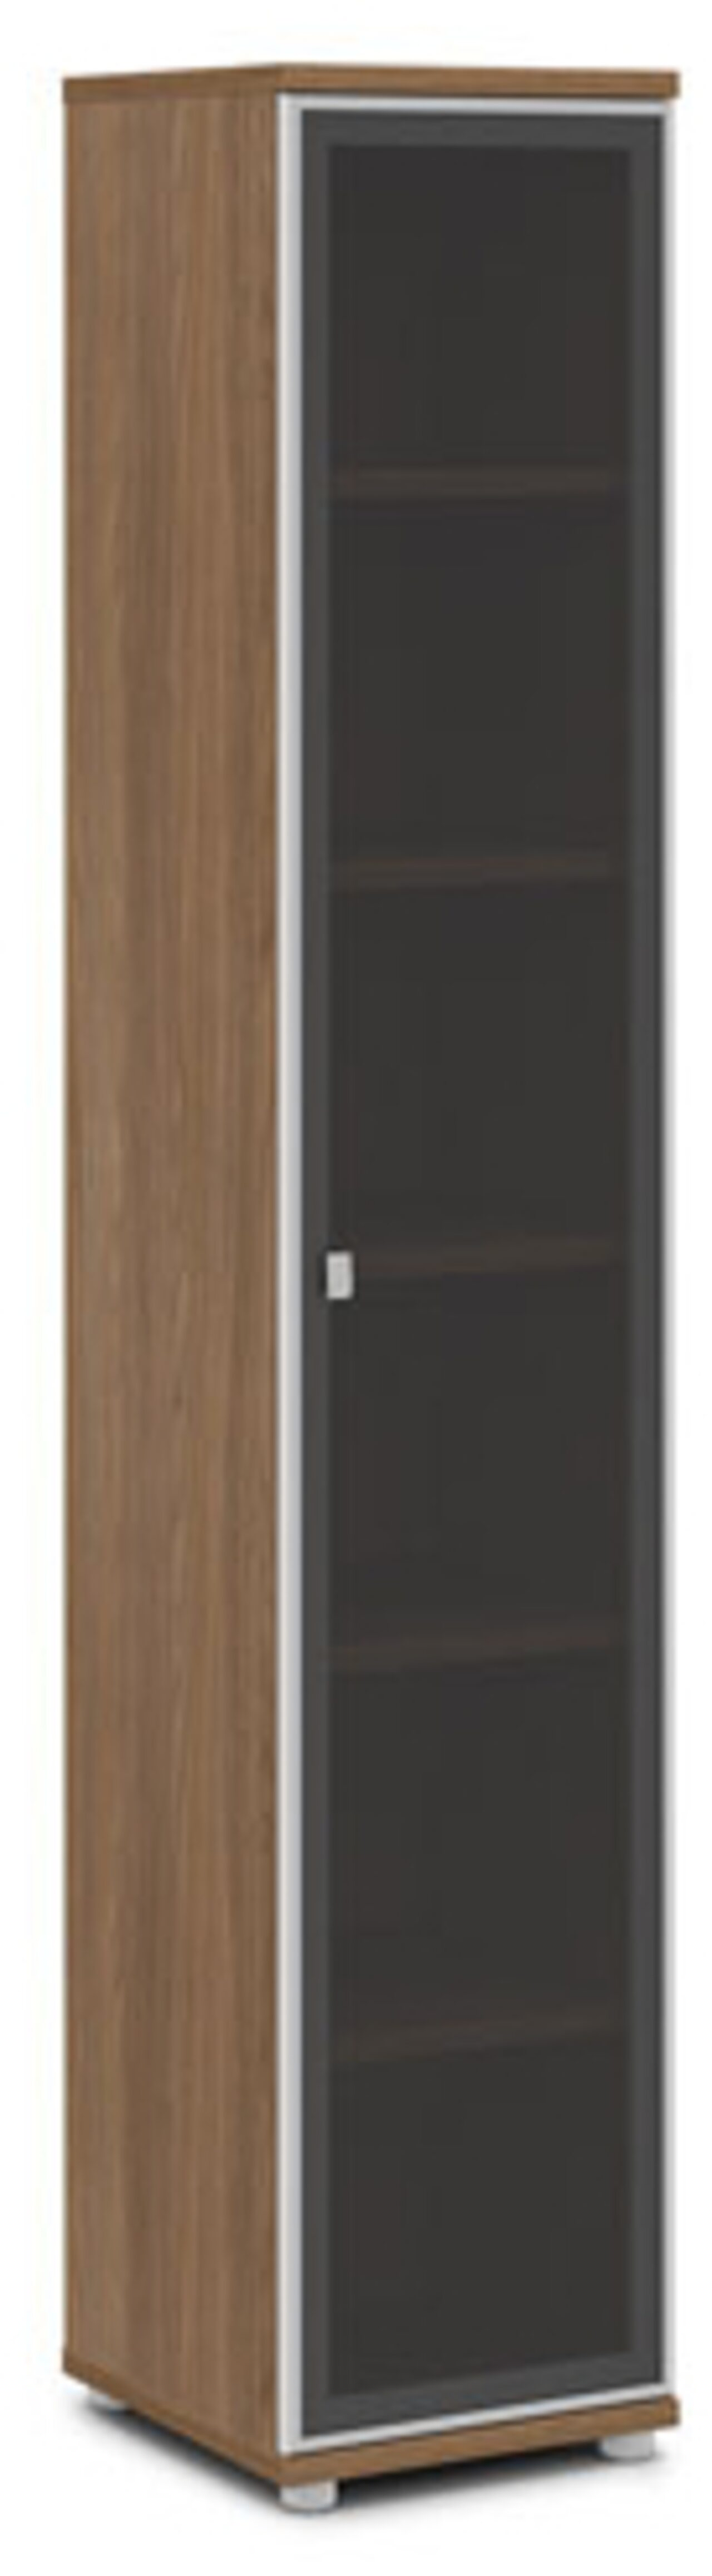 Шкаф со стеклом в алюминиевом профиле  Vasanta 42x44x220 - фото 5